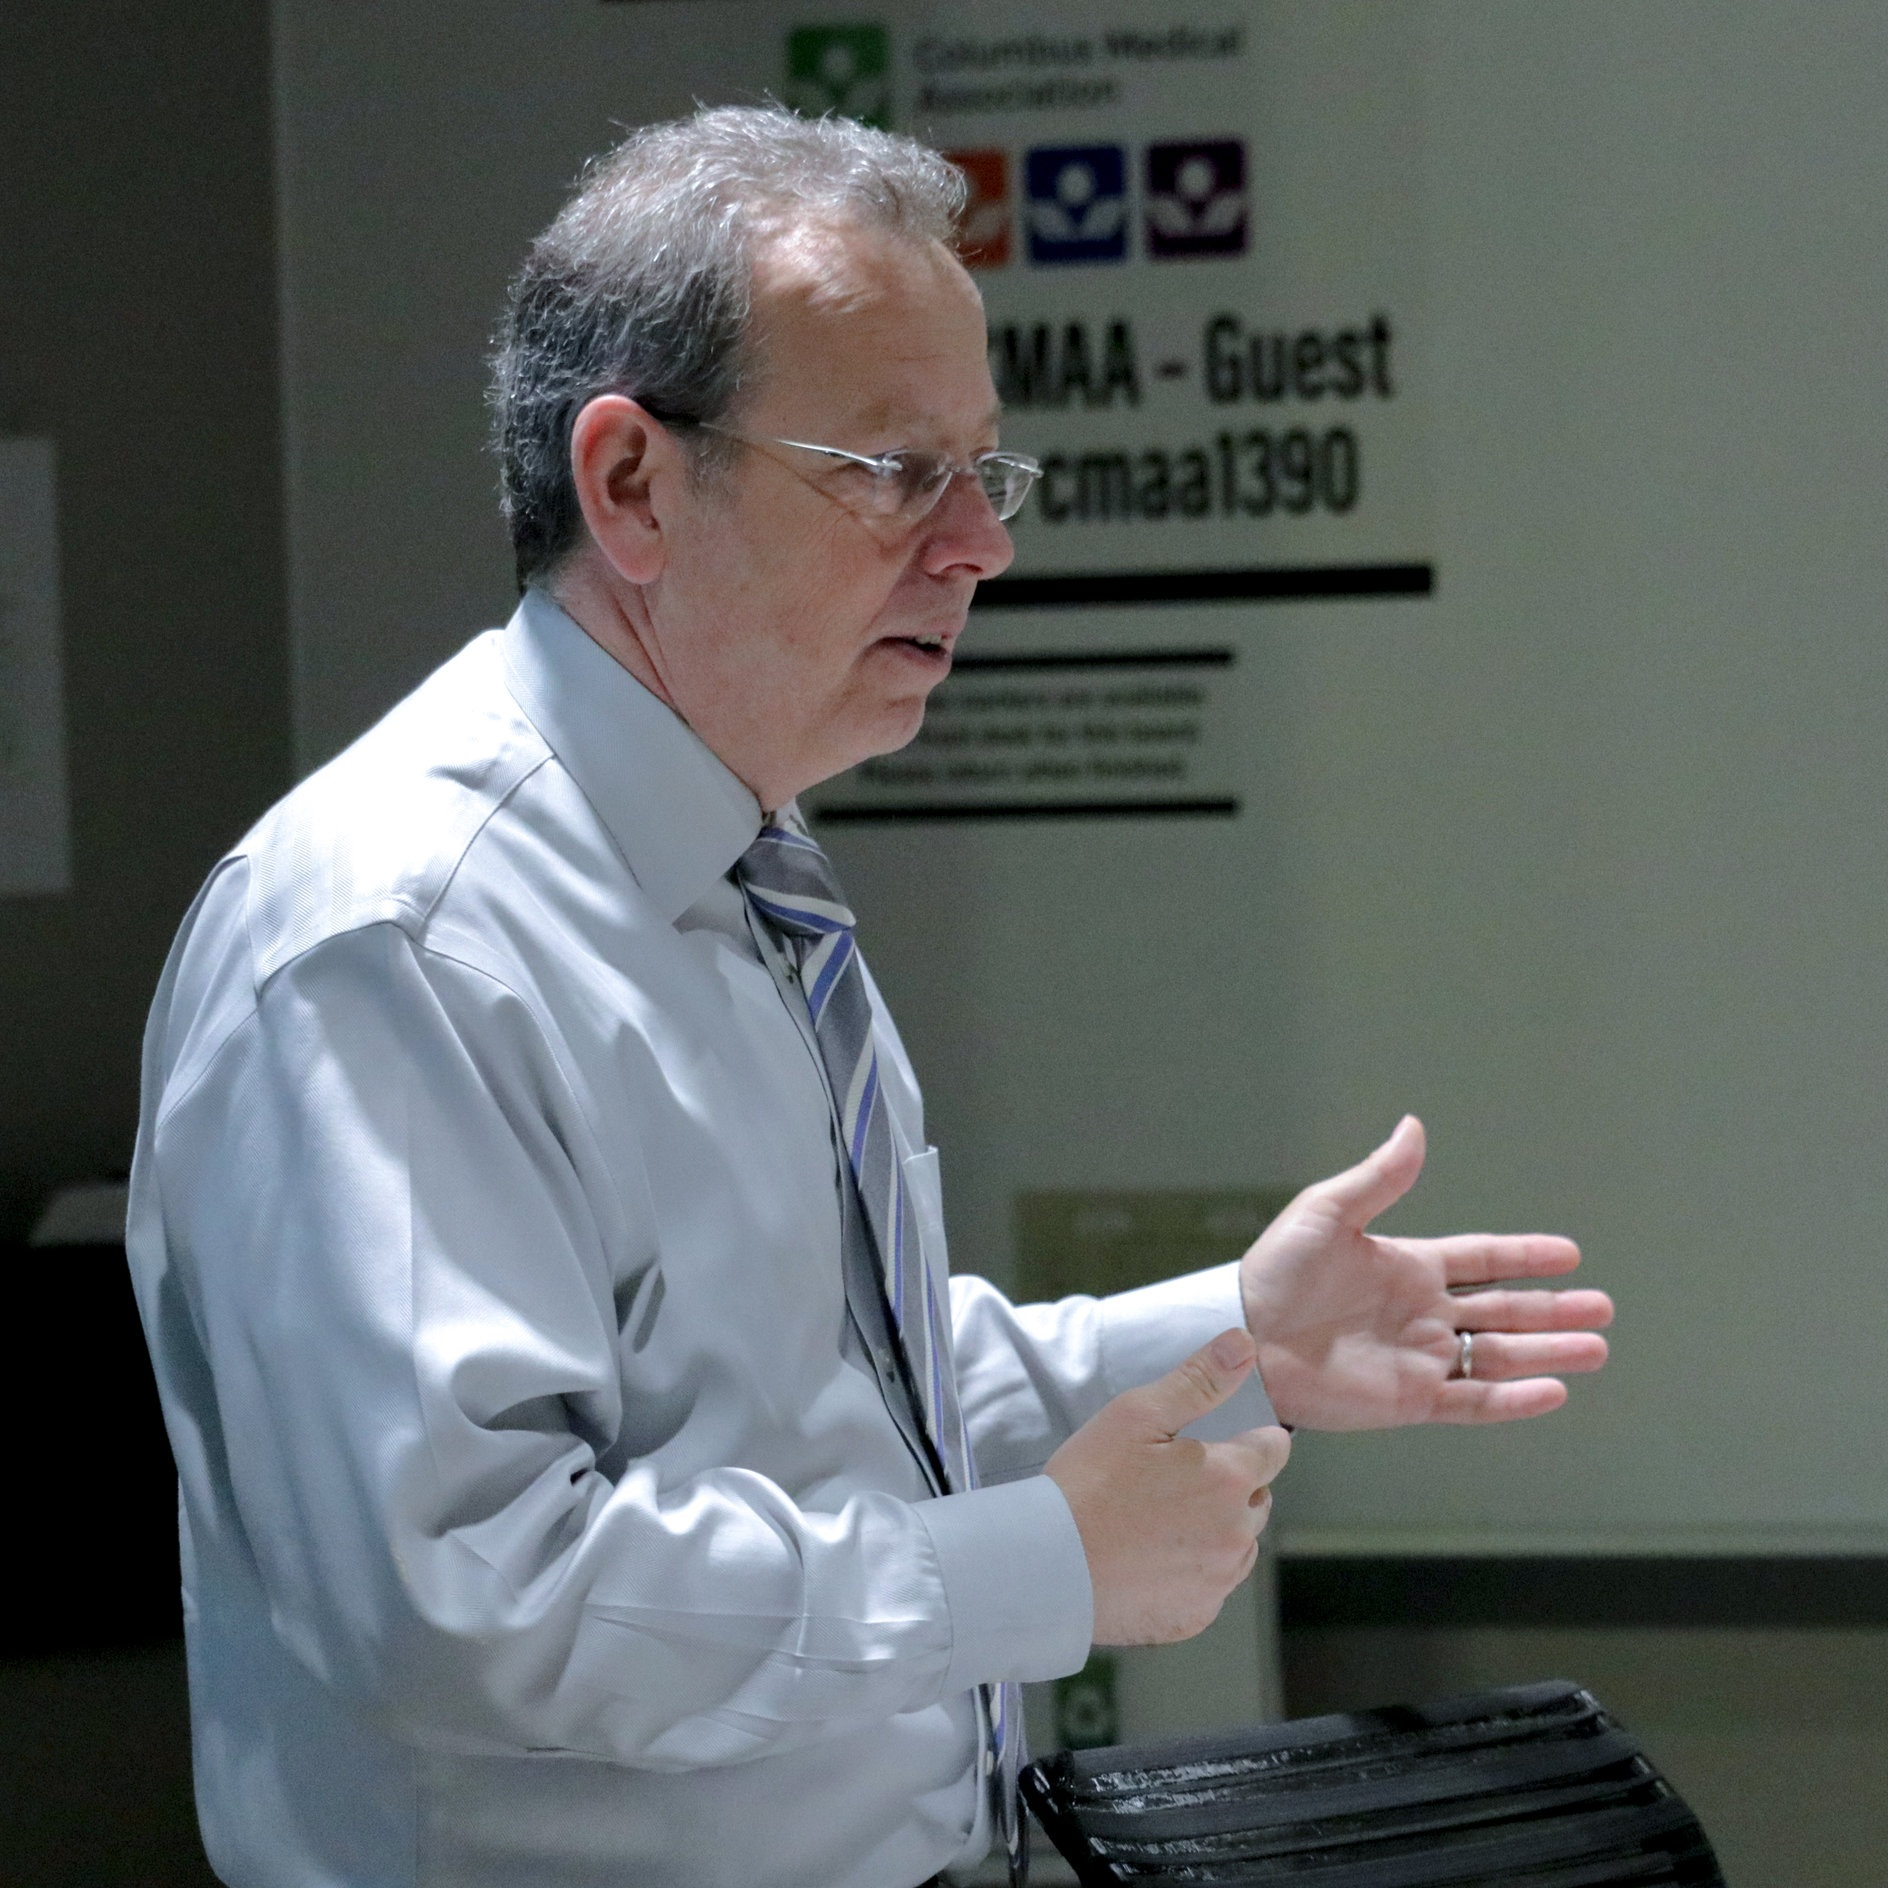 Derek Rowan presenting the HICS training